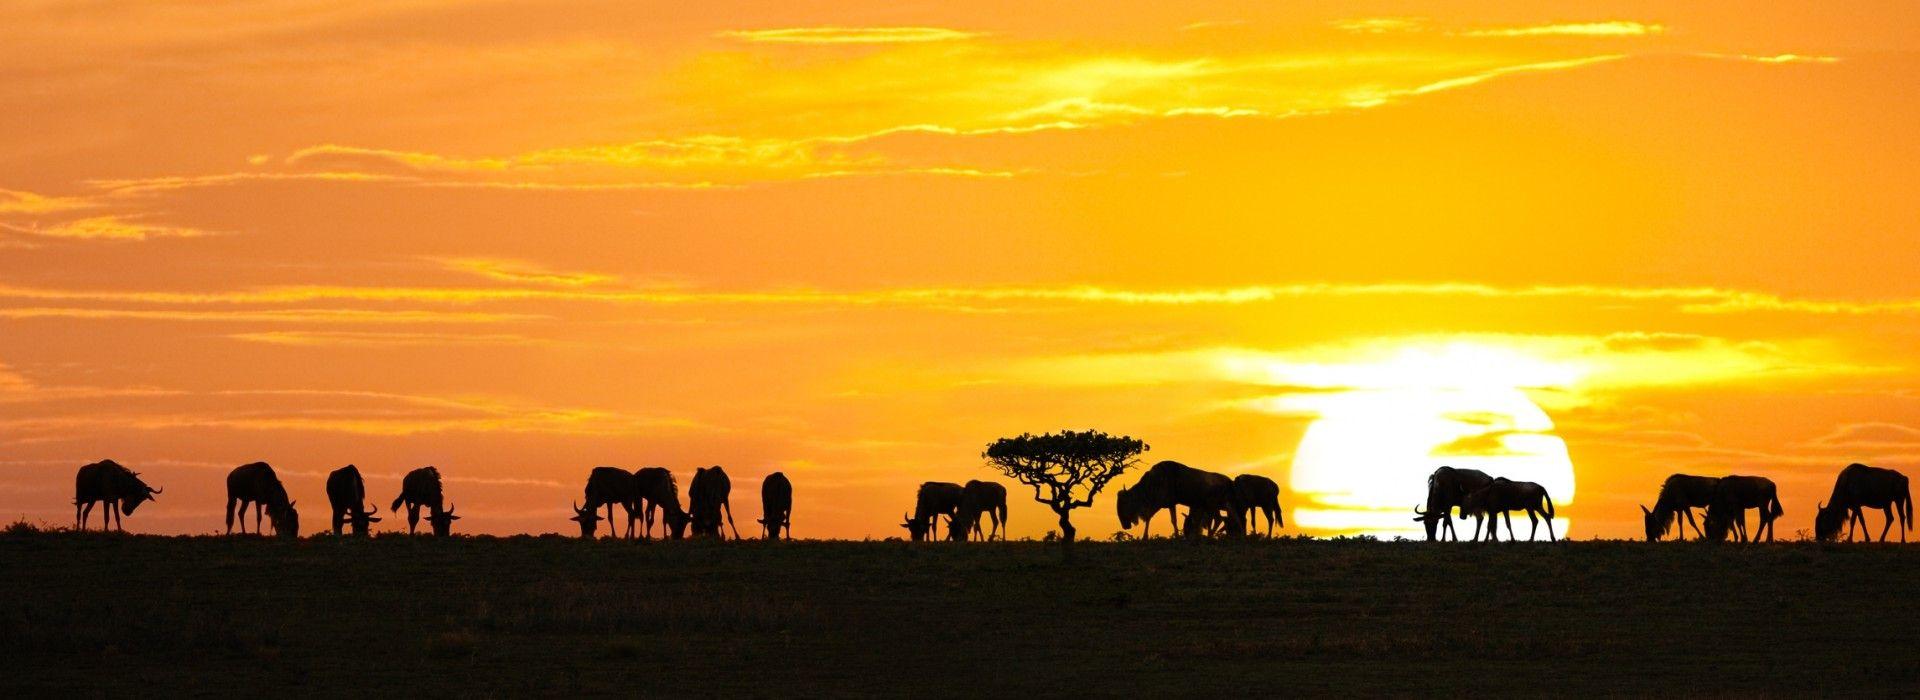 Road trips Tours in Kilimanjaro